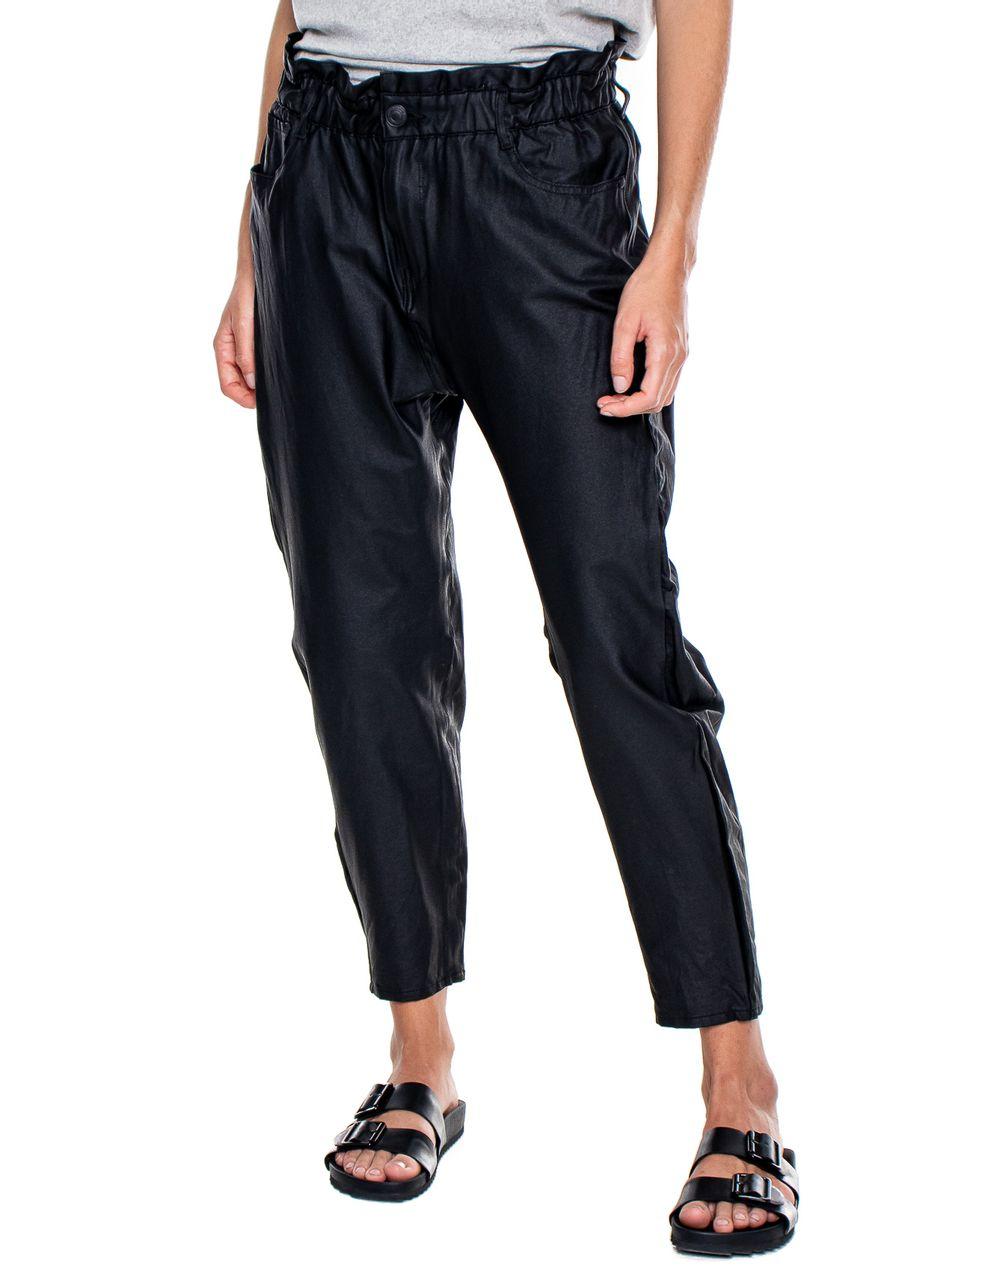 pantalon-114801-negro-1.jpg